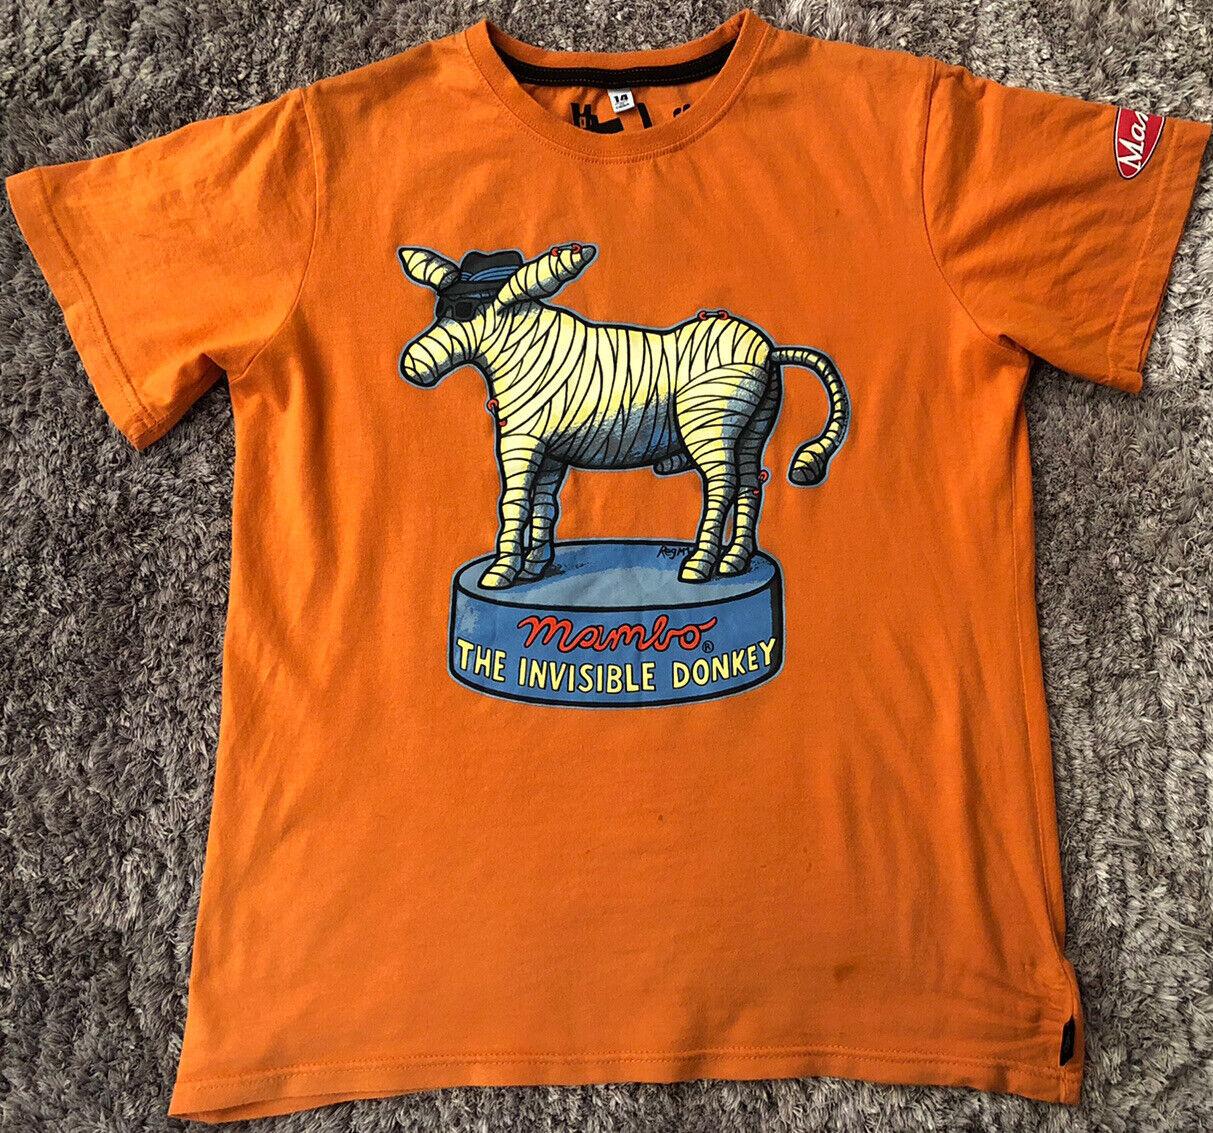 087 Authentic Mambo The Invisible Donkey Reg Mombassa 1 T Shirt Kids 14